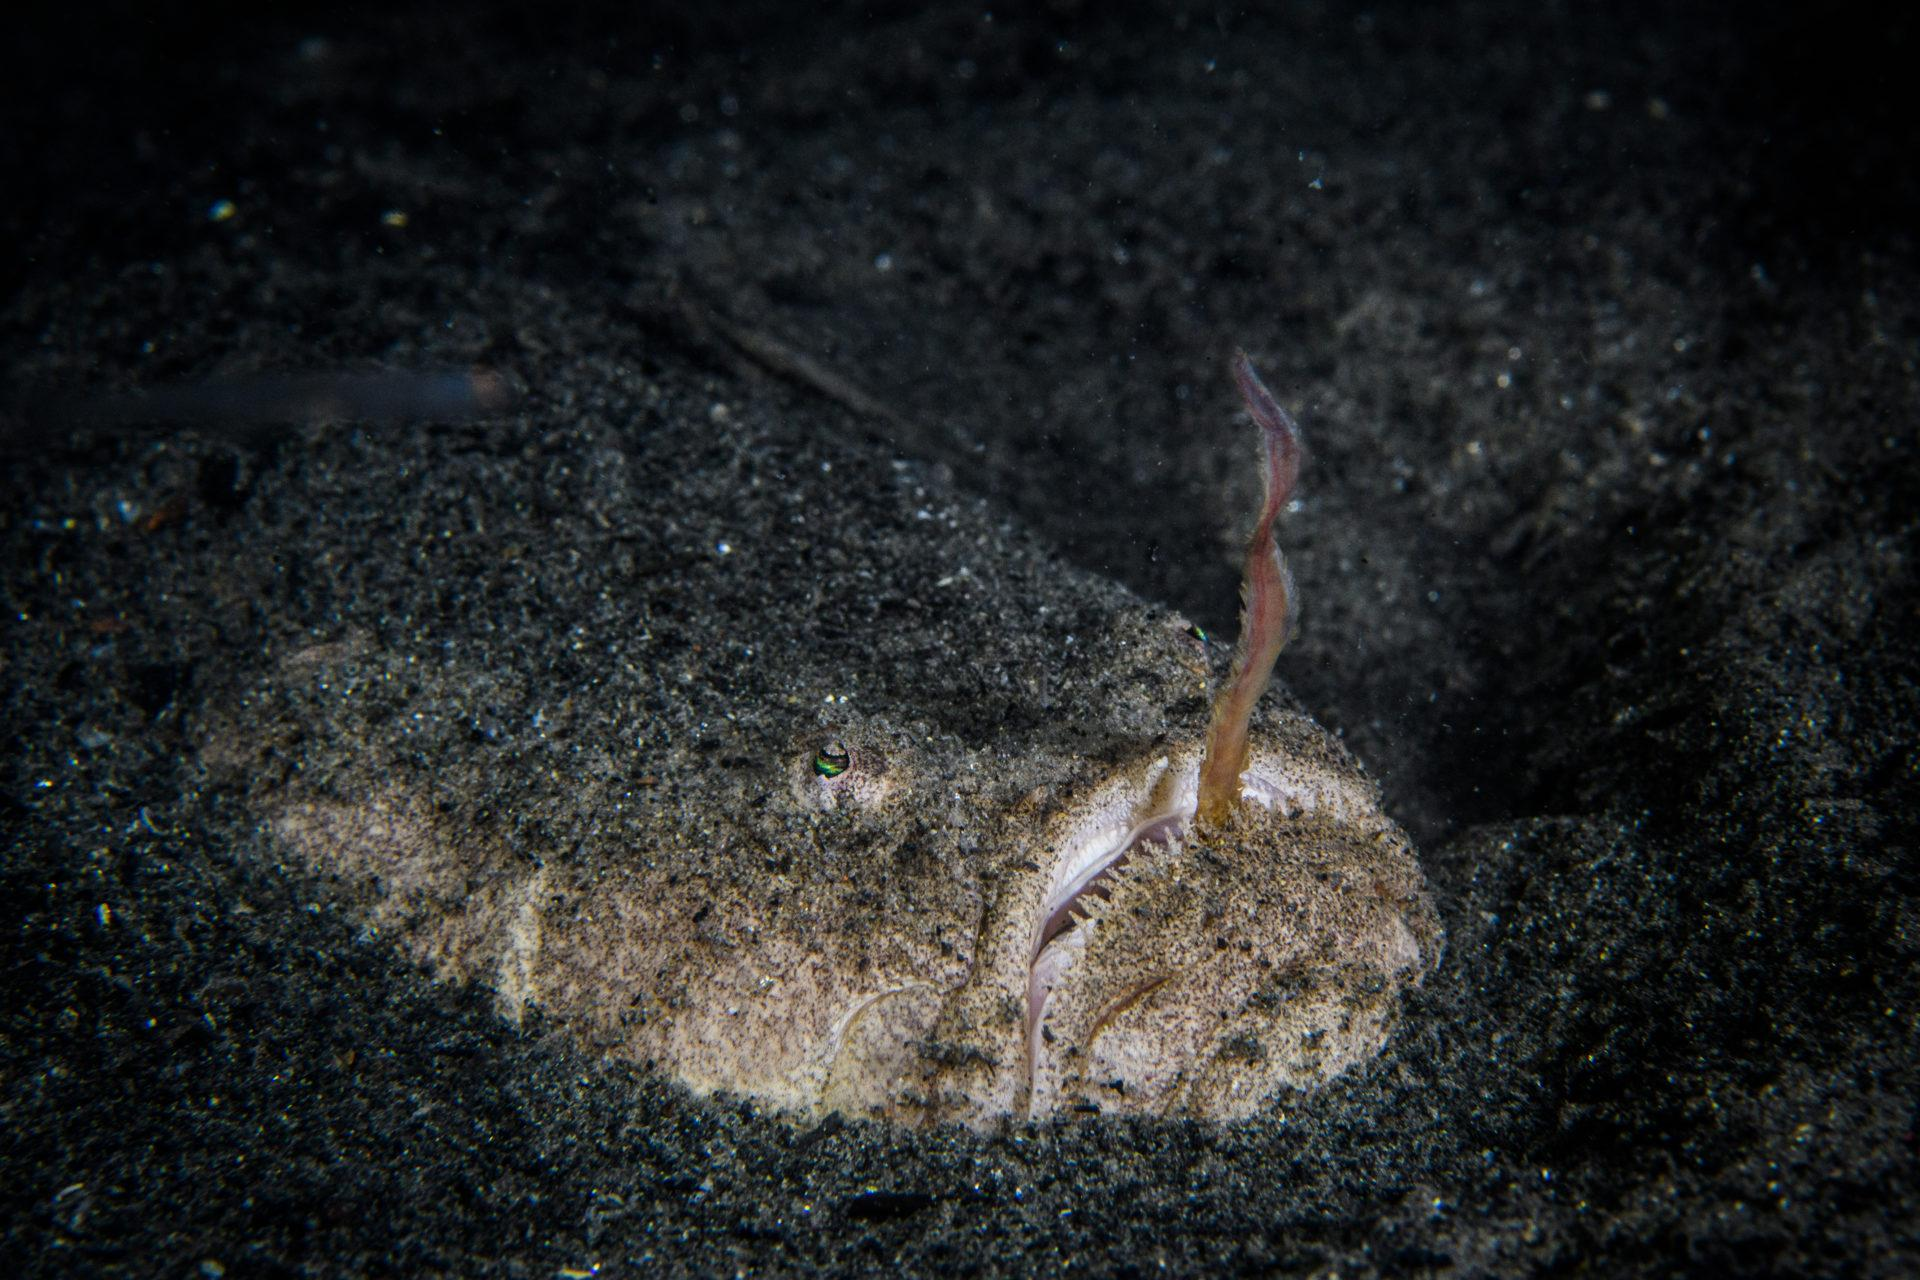 Burst mode – Underwater Photography Masterclass